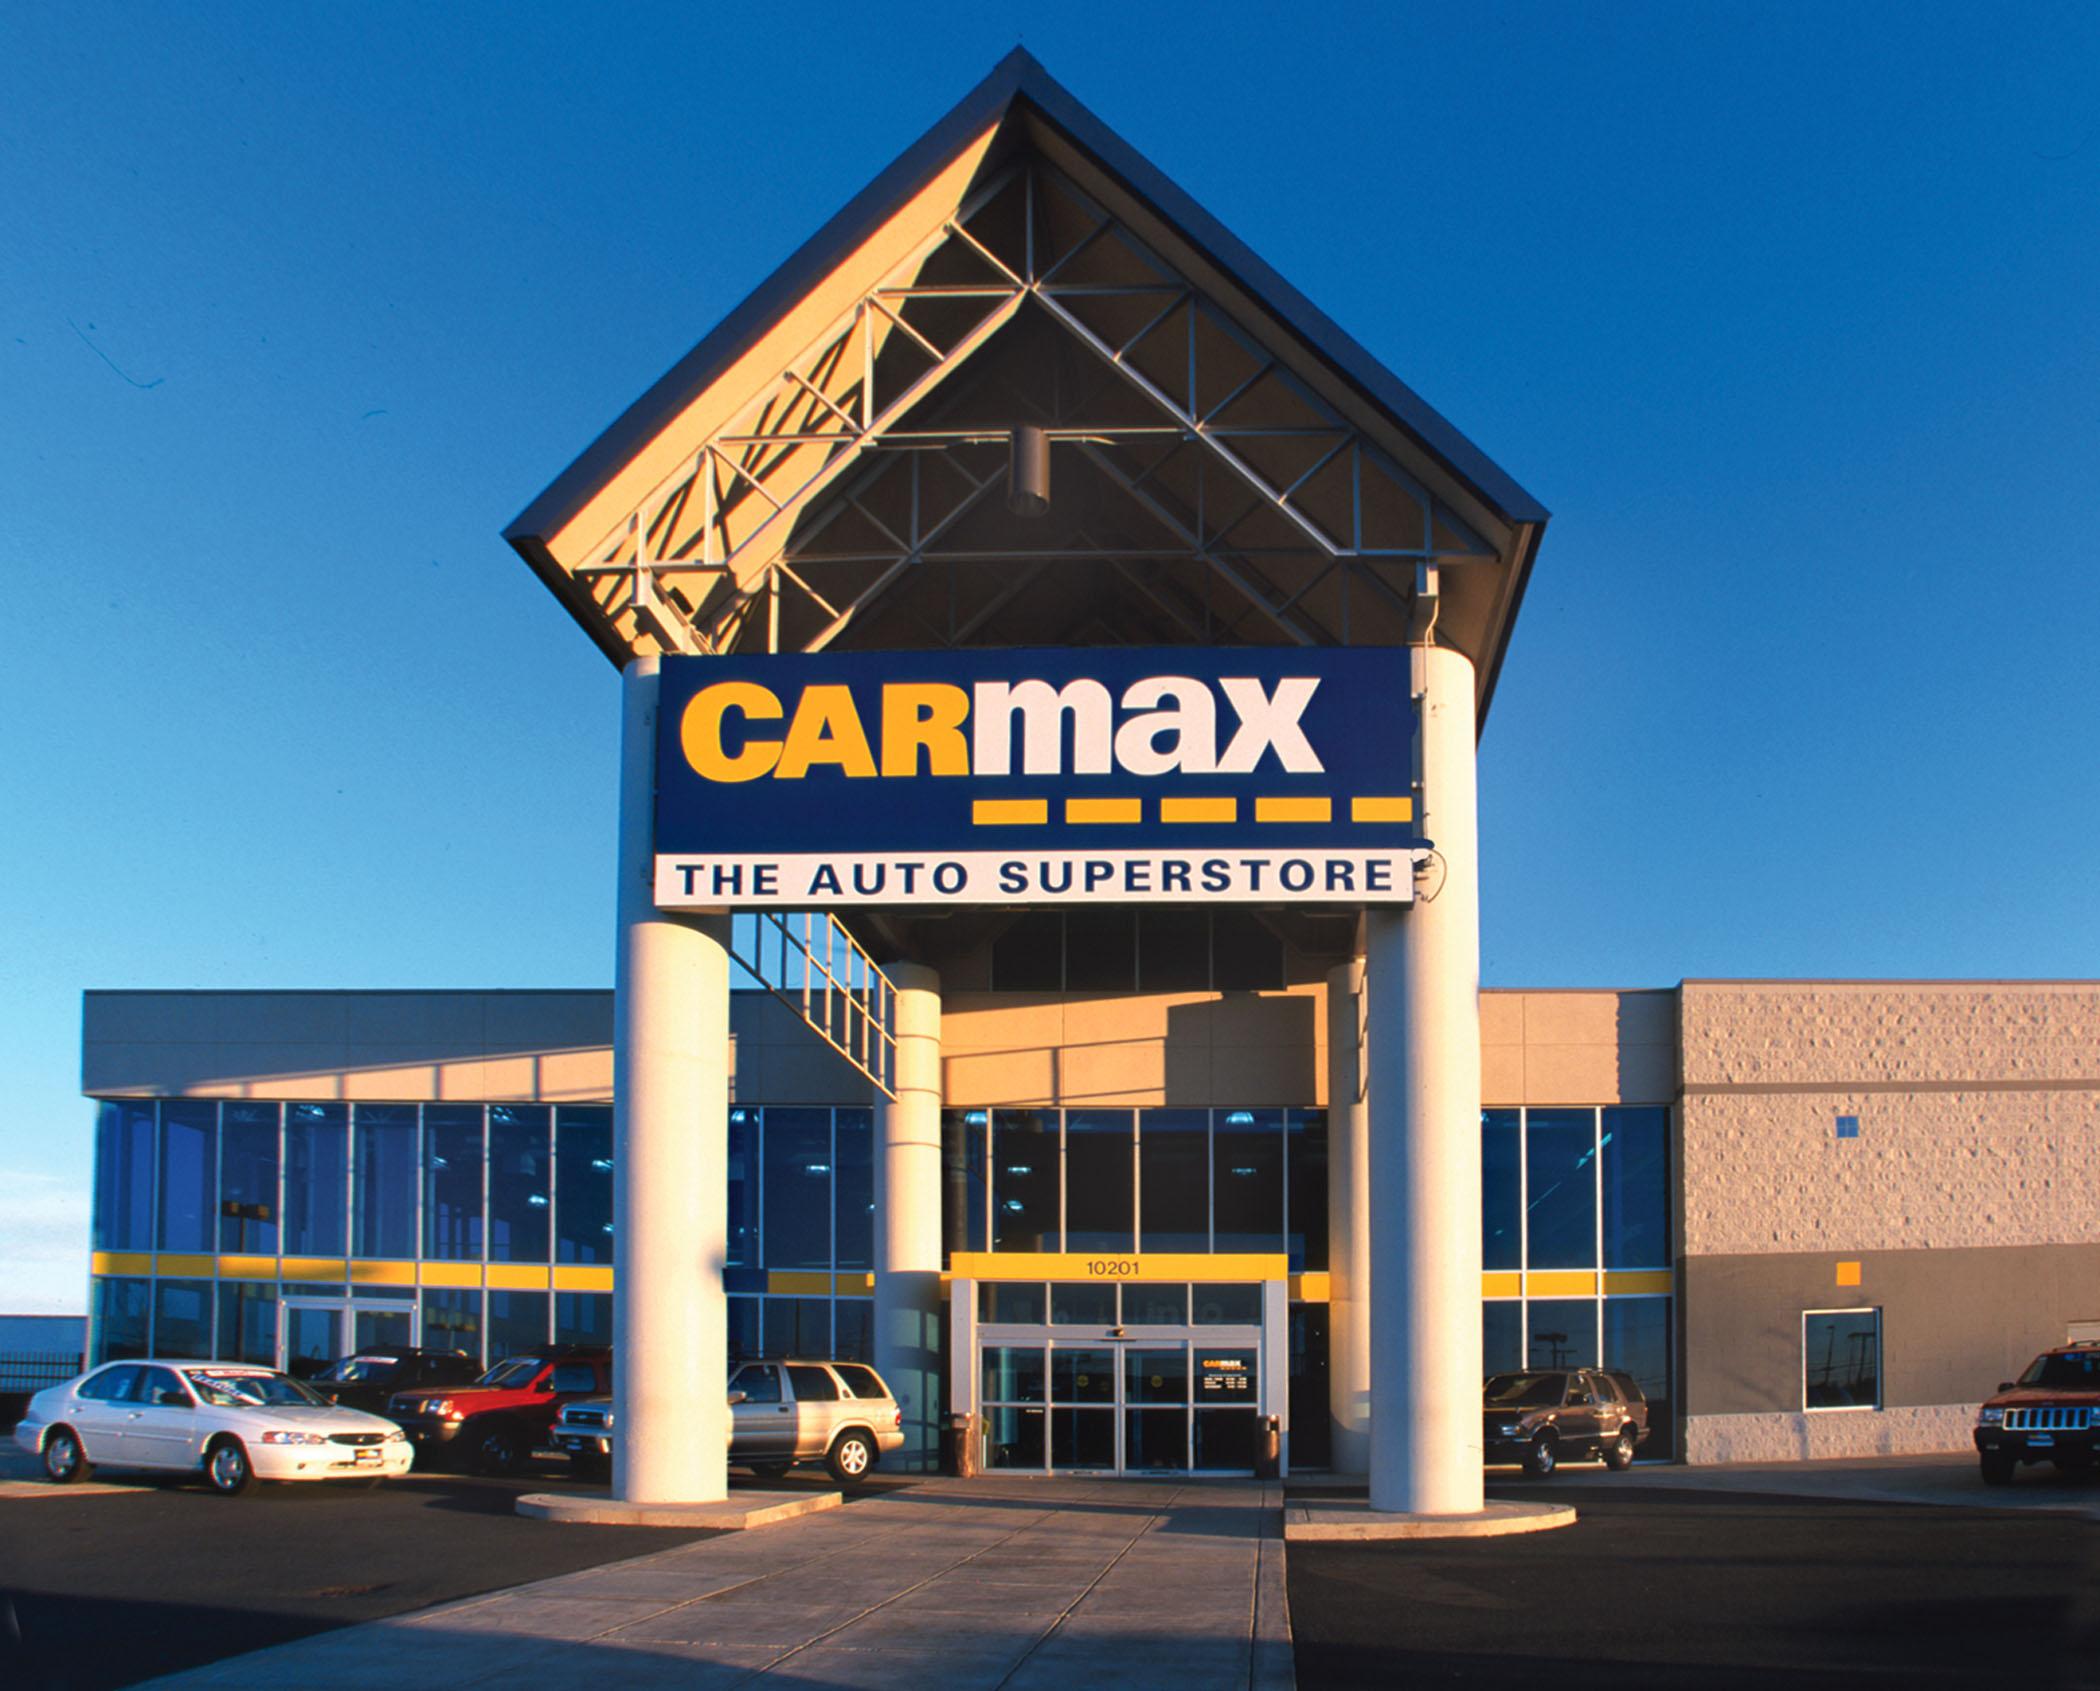 Carmax Drives Higher Despite Sluggish Used Car S Growth